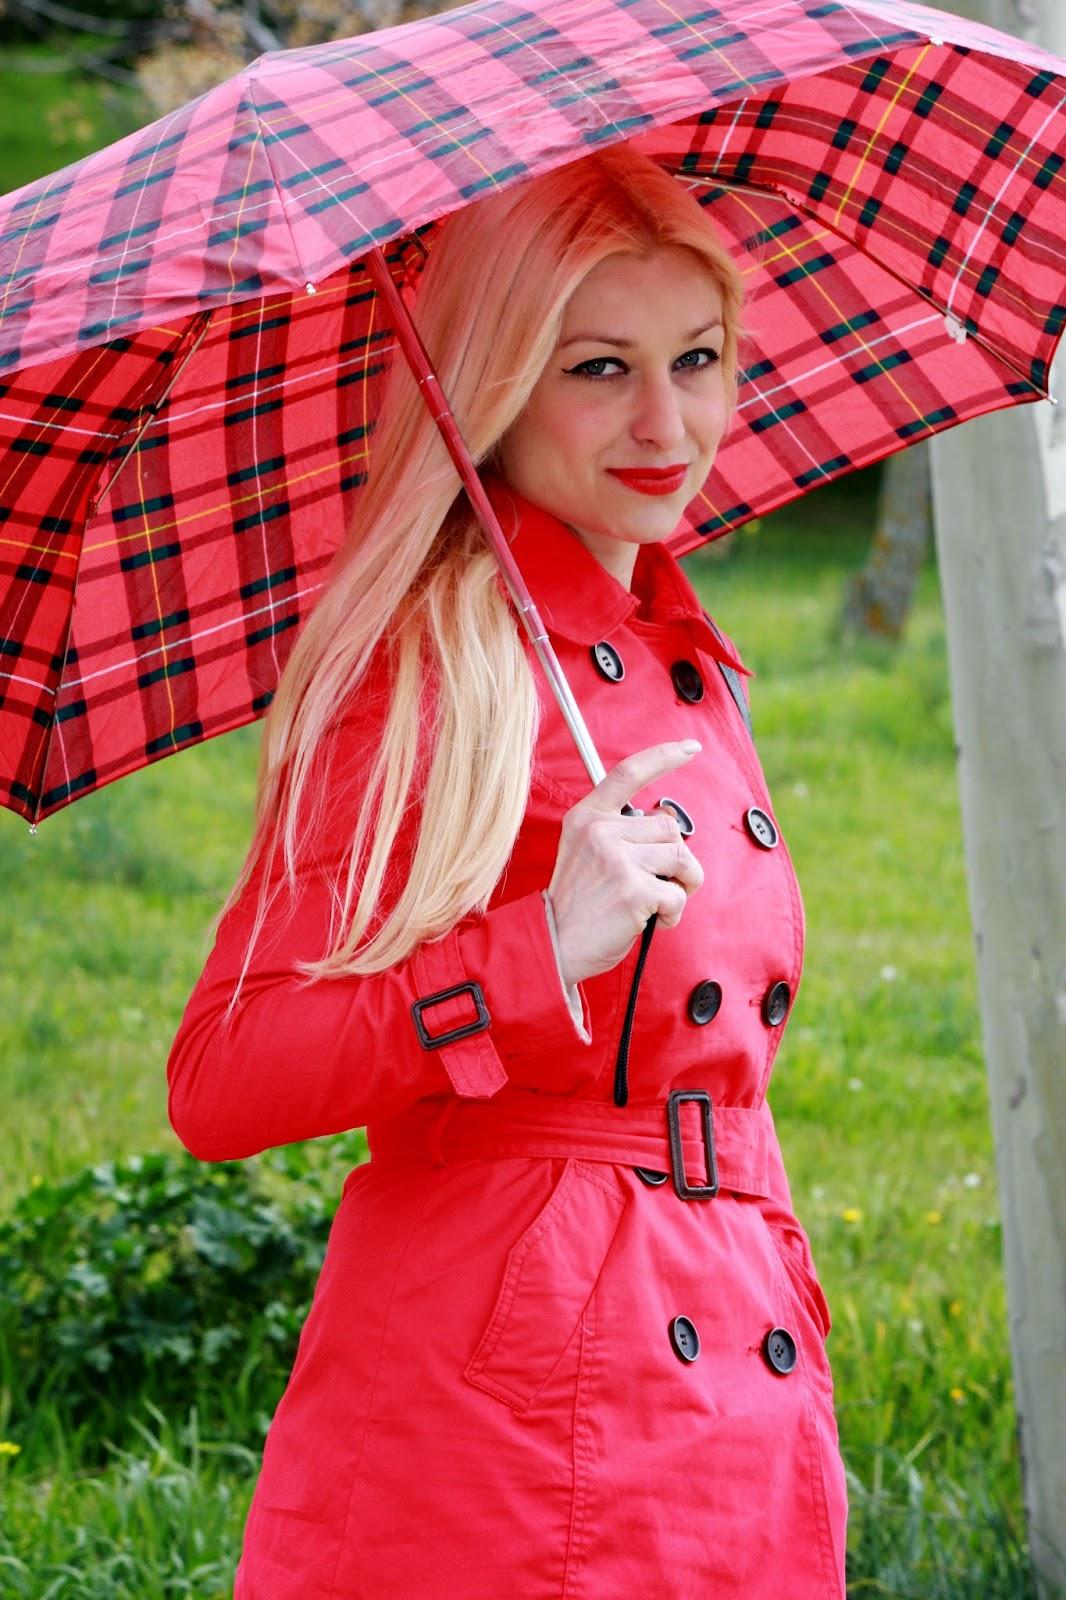 paraguas de moda miriam in vogue